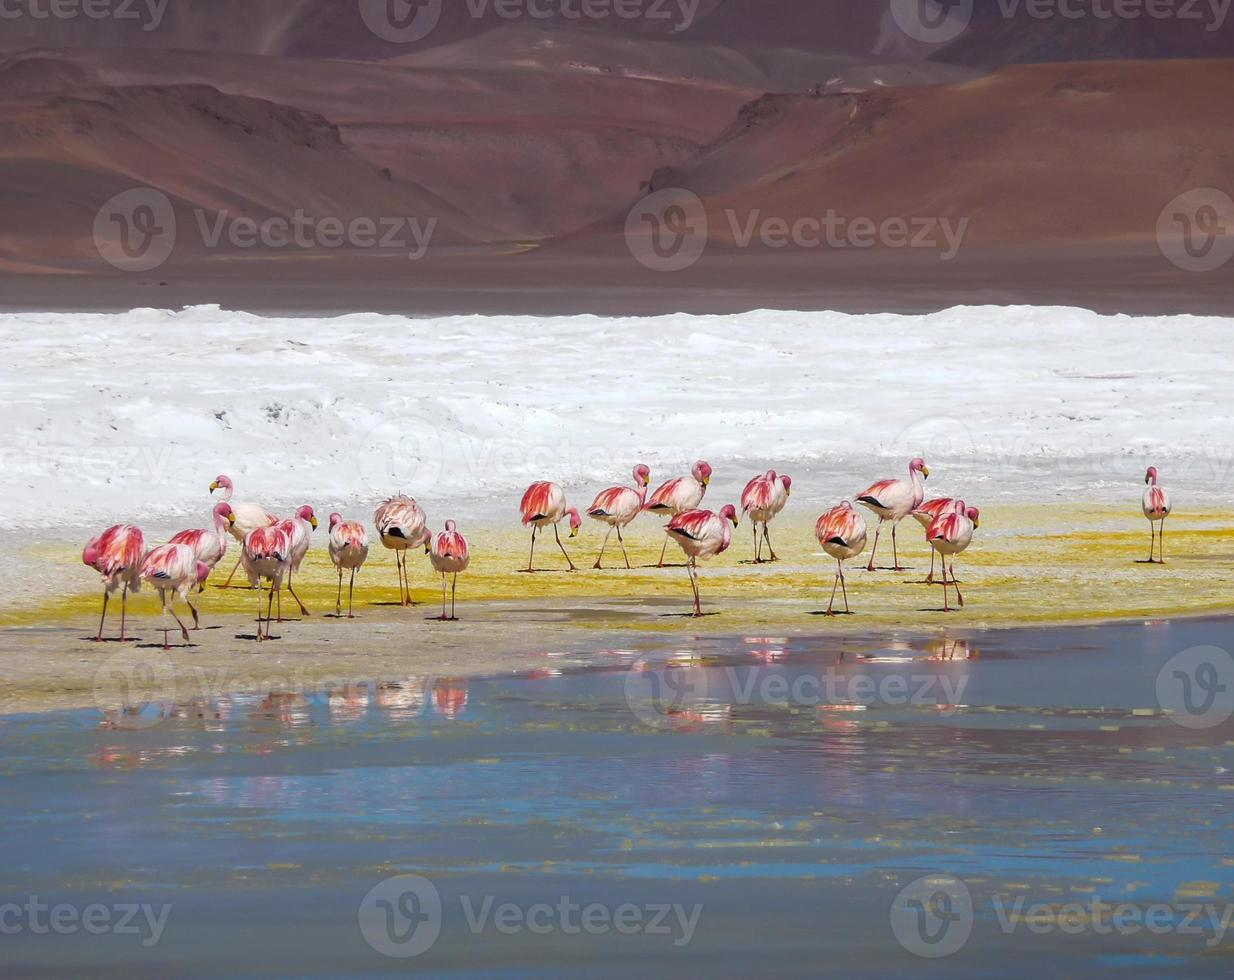 atacama-flamingos i gul jord foto